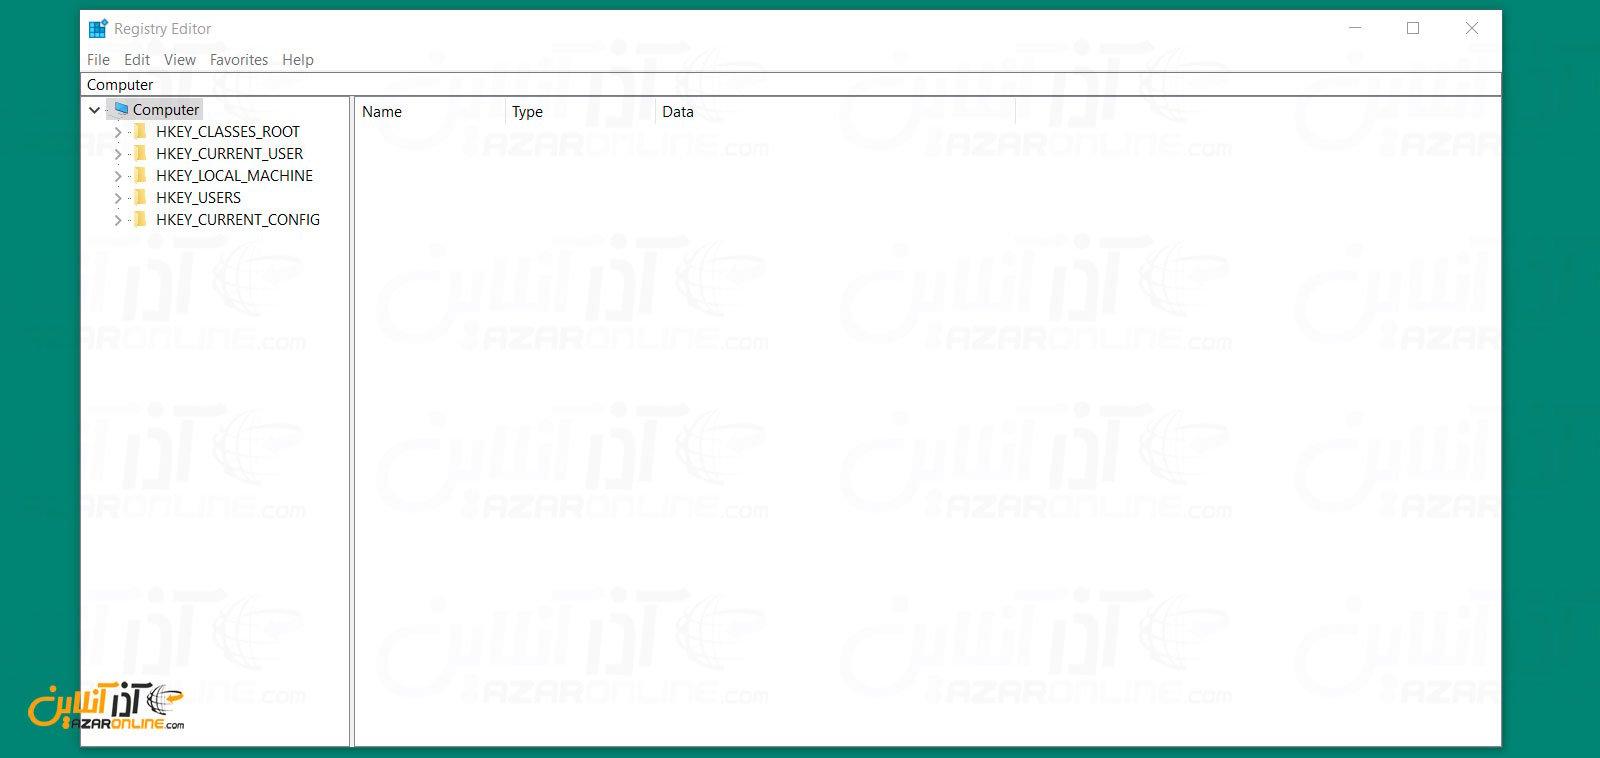 صفحه registry